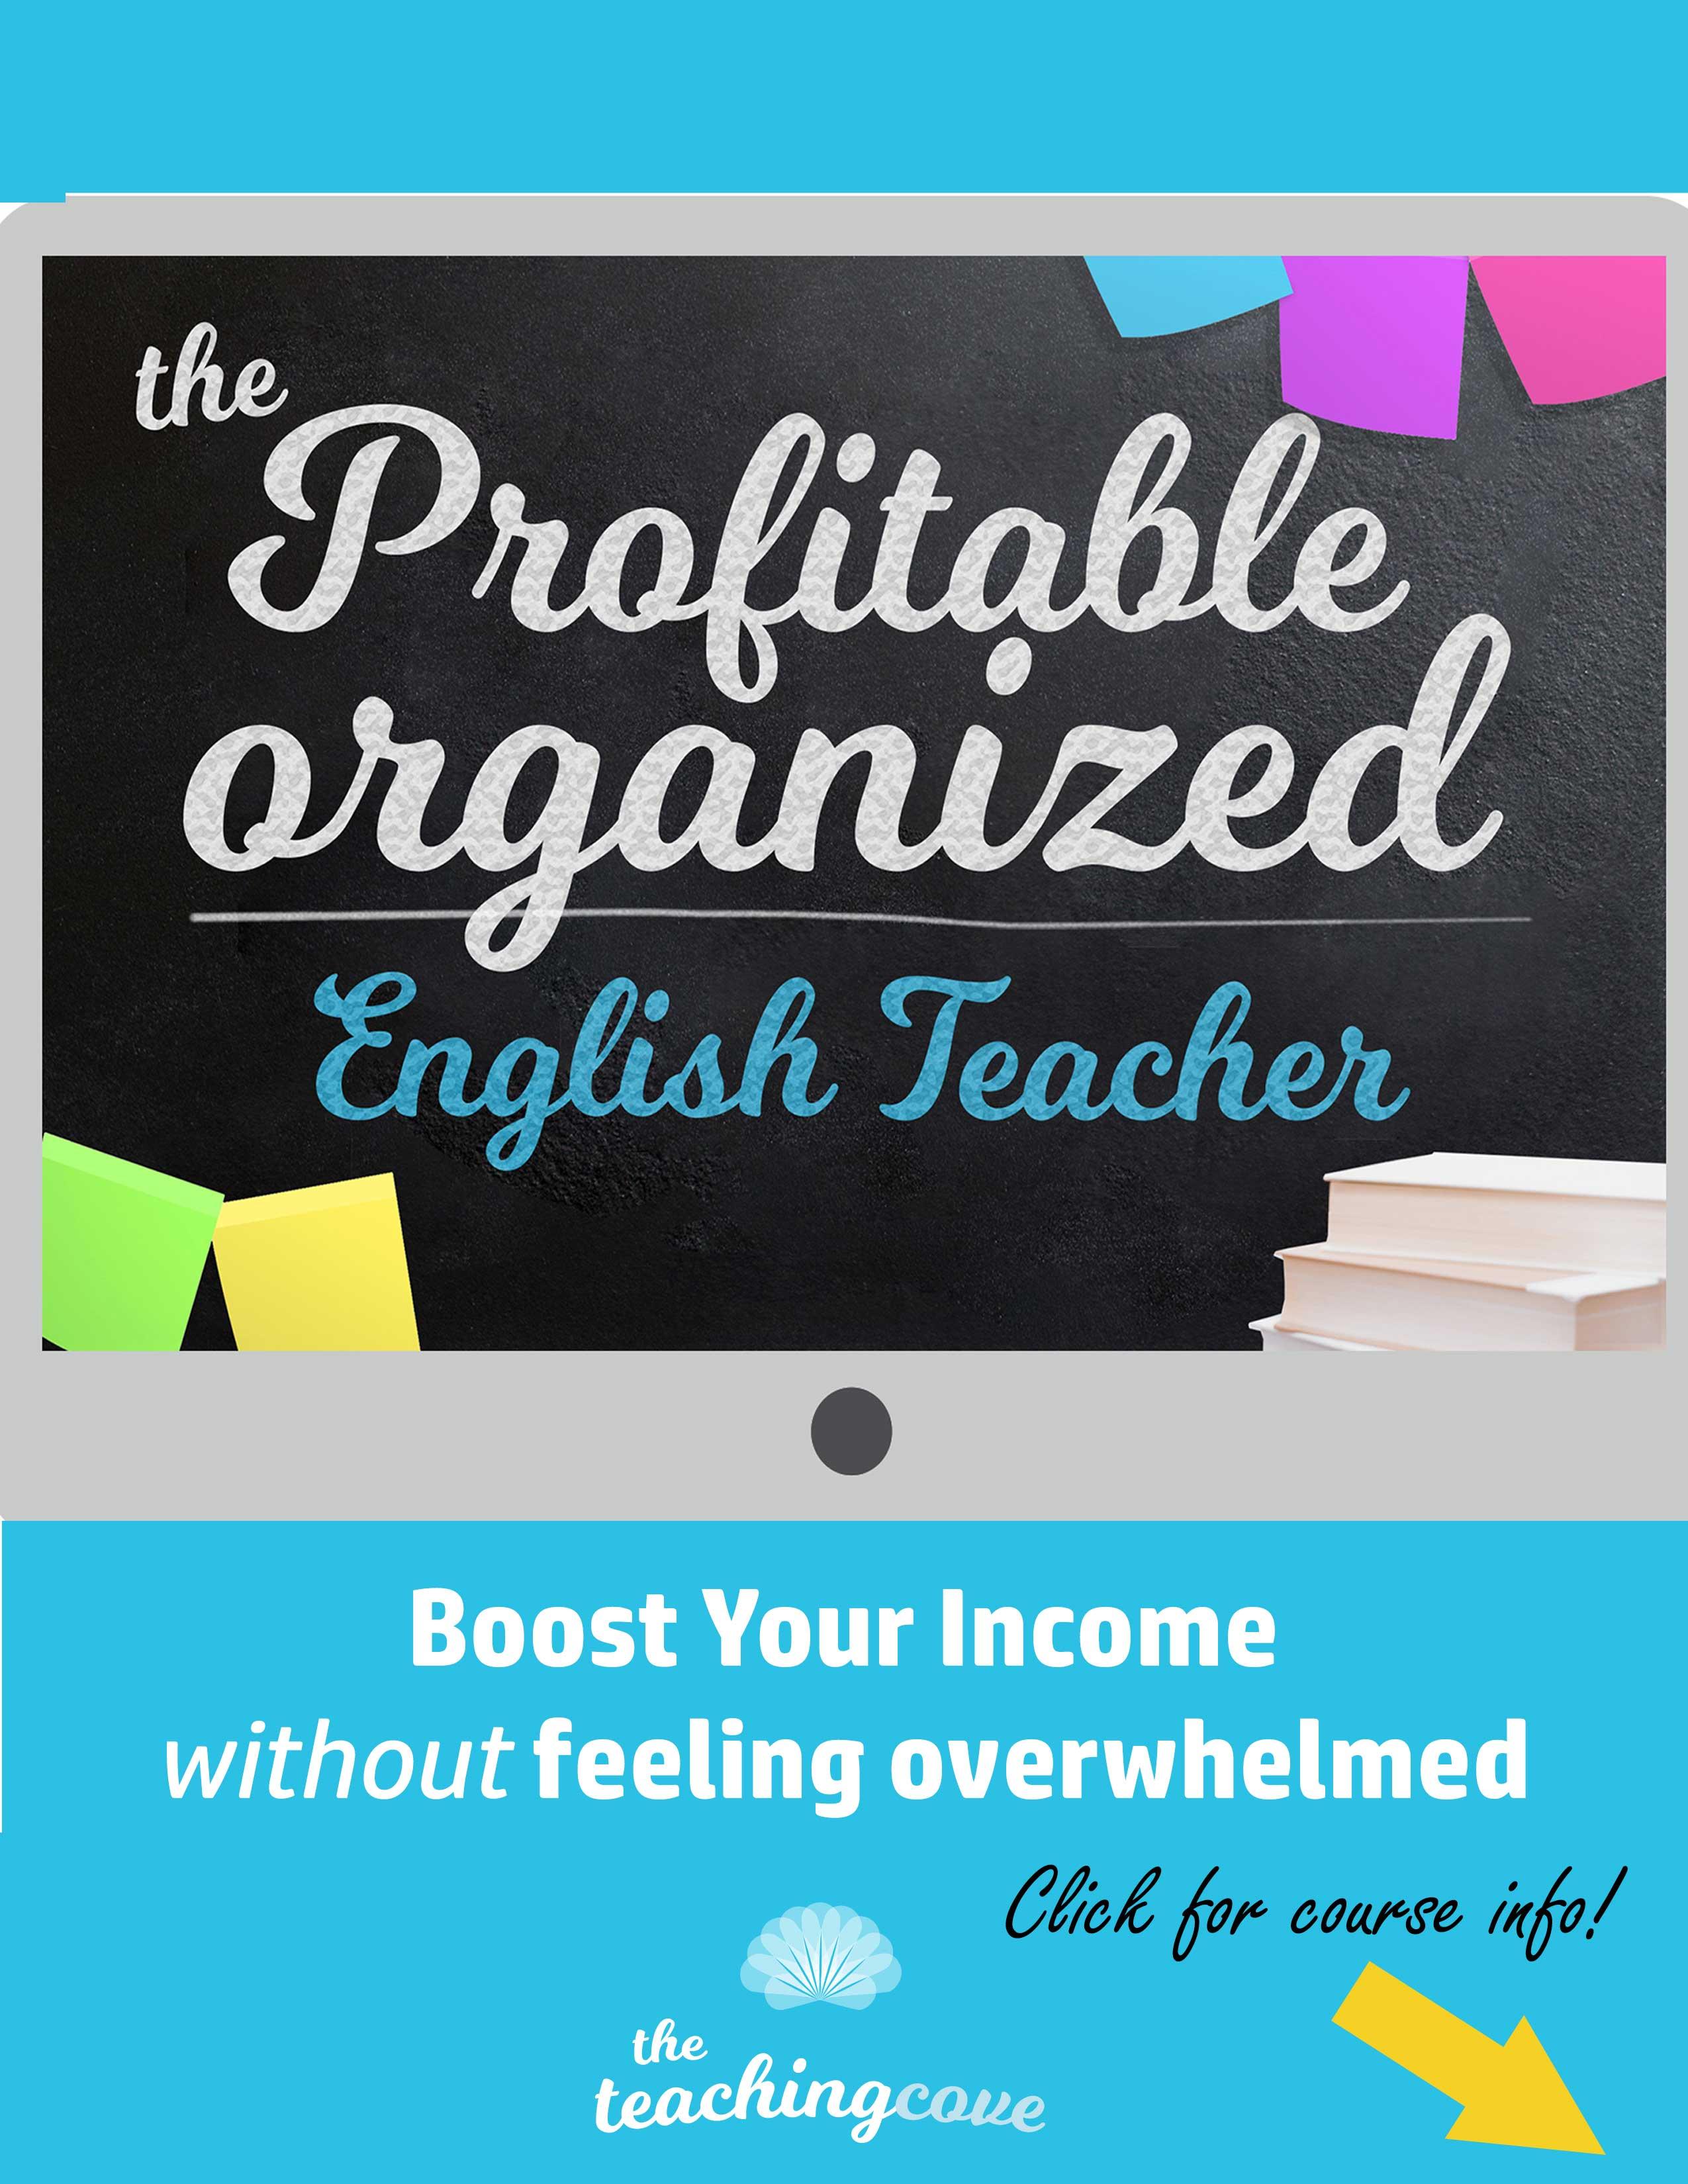 Profitable Organized English Teacher Course - Boost Your Income